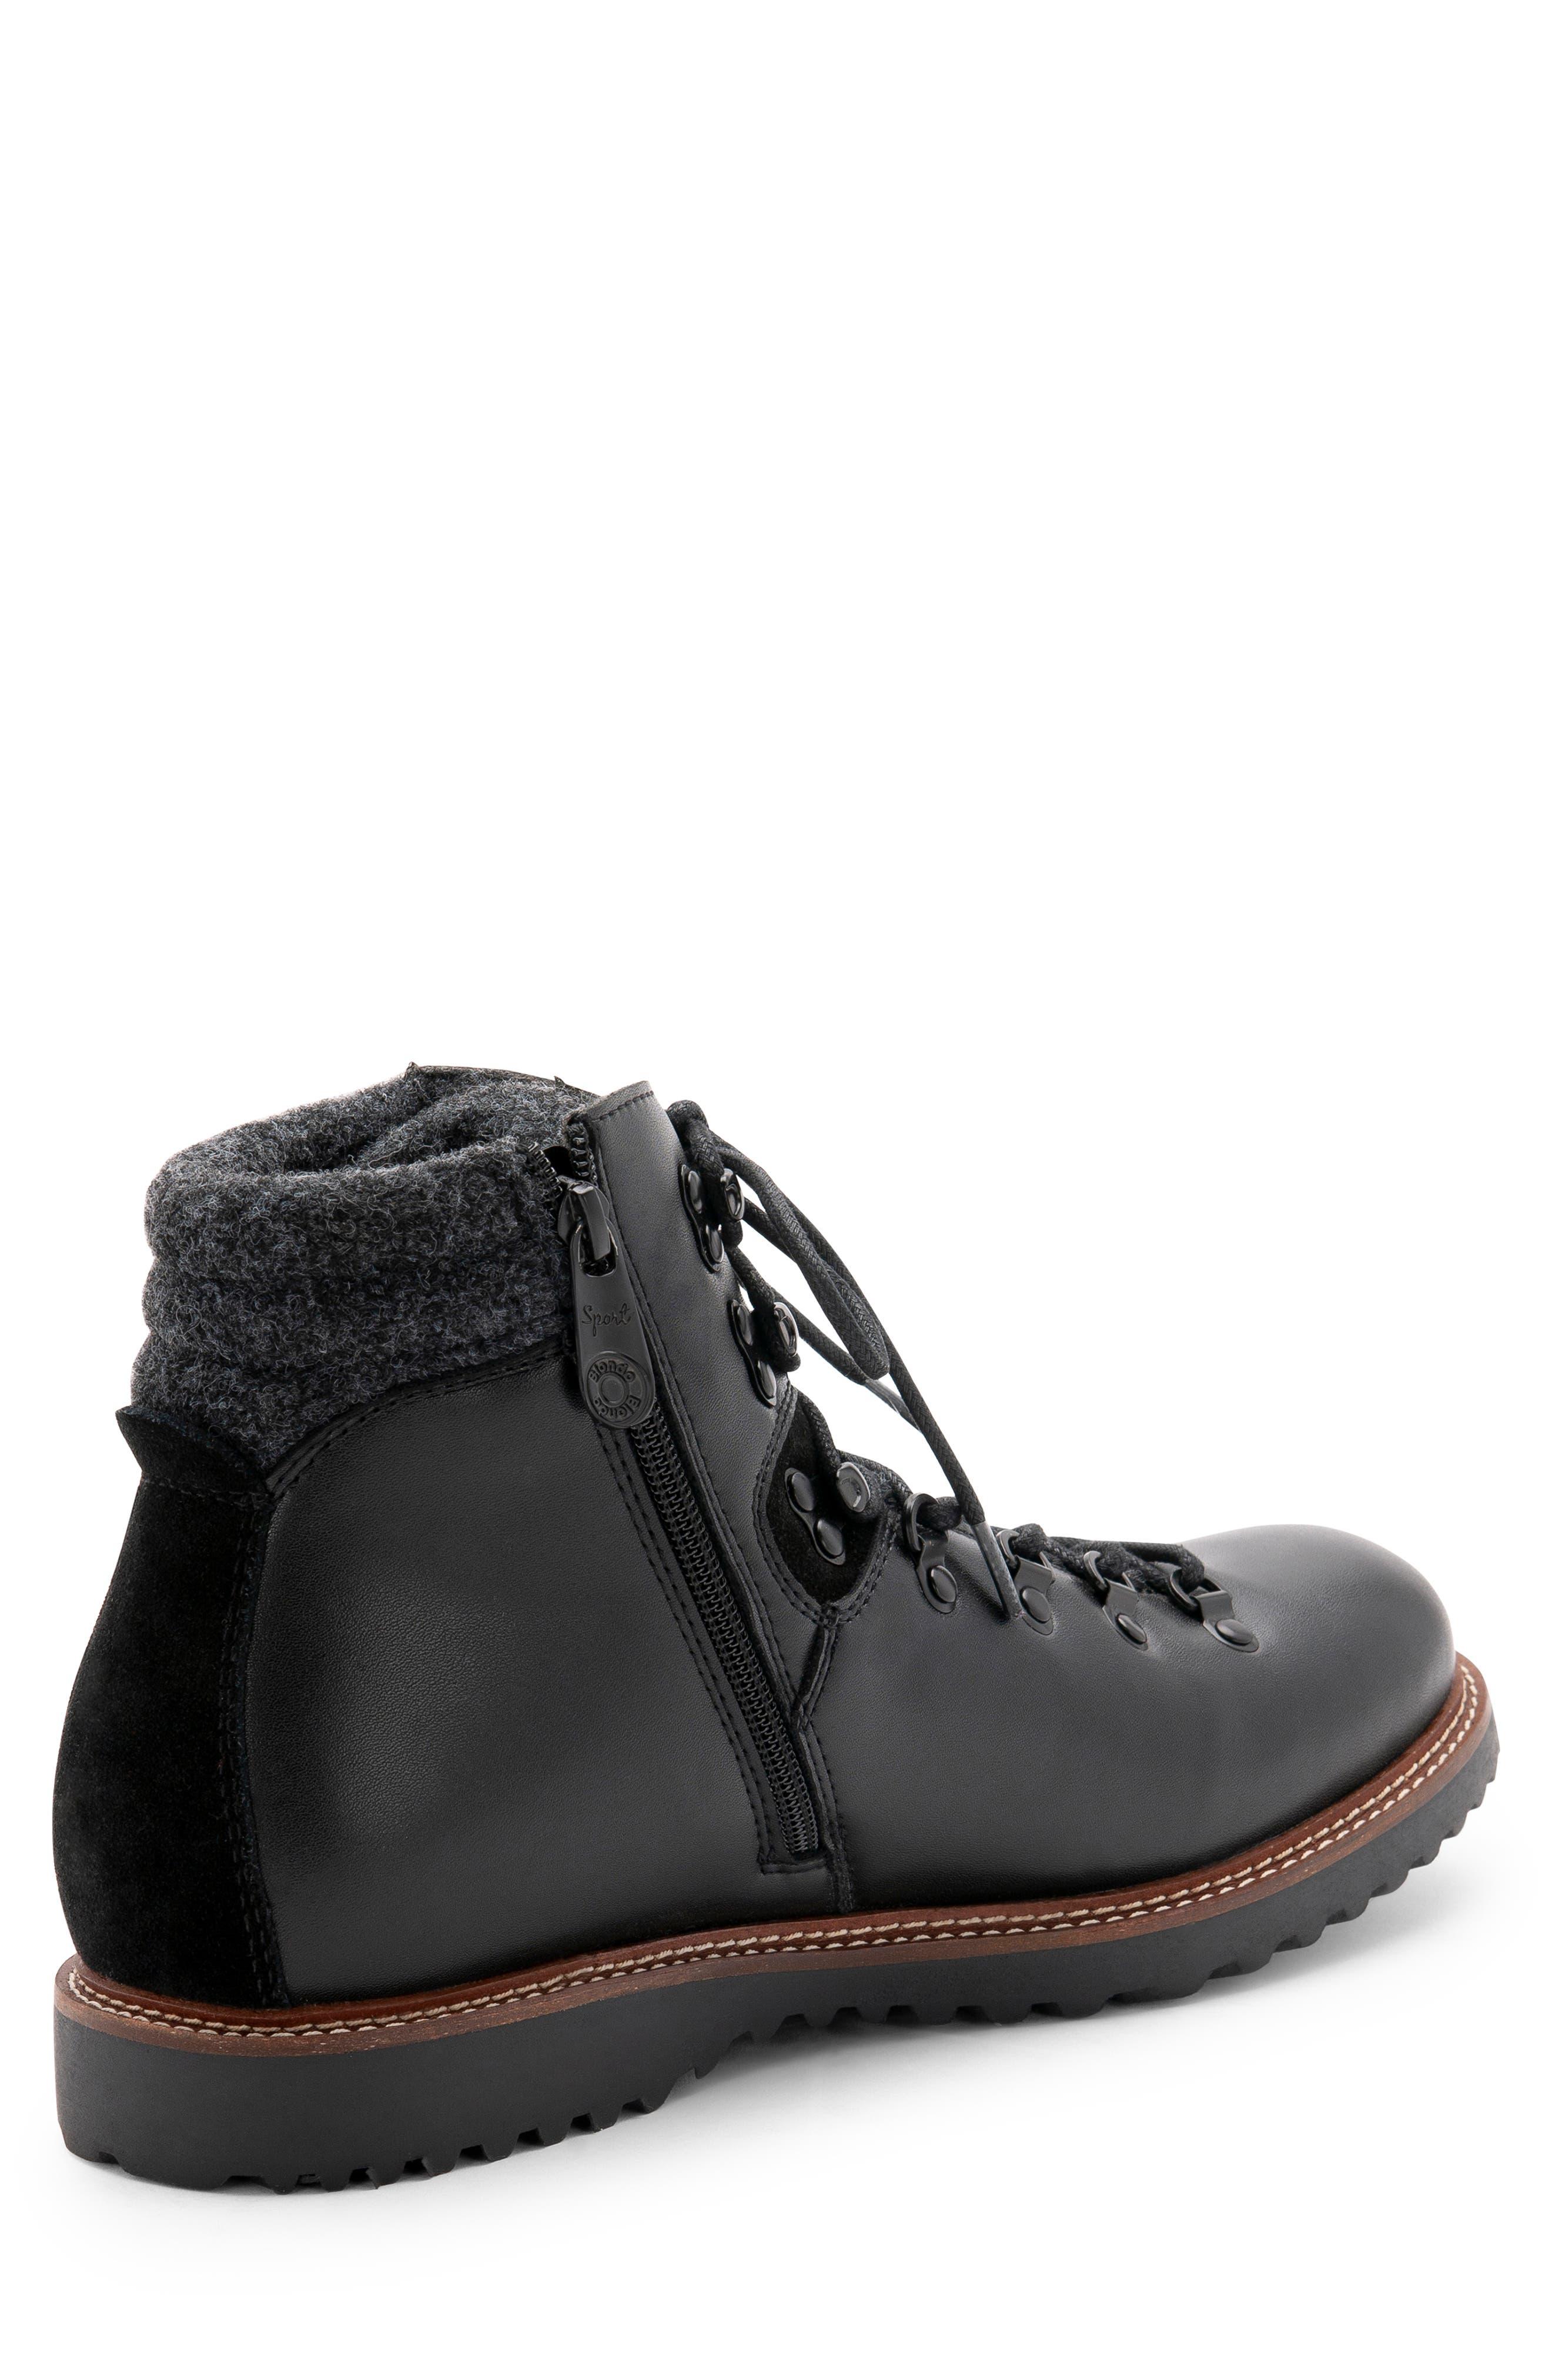 BLONDO, Morgan Waterproof Plain Toe Boot, Alternate thumbnail 7, color, BLACK LEATHER